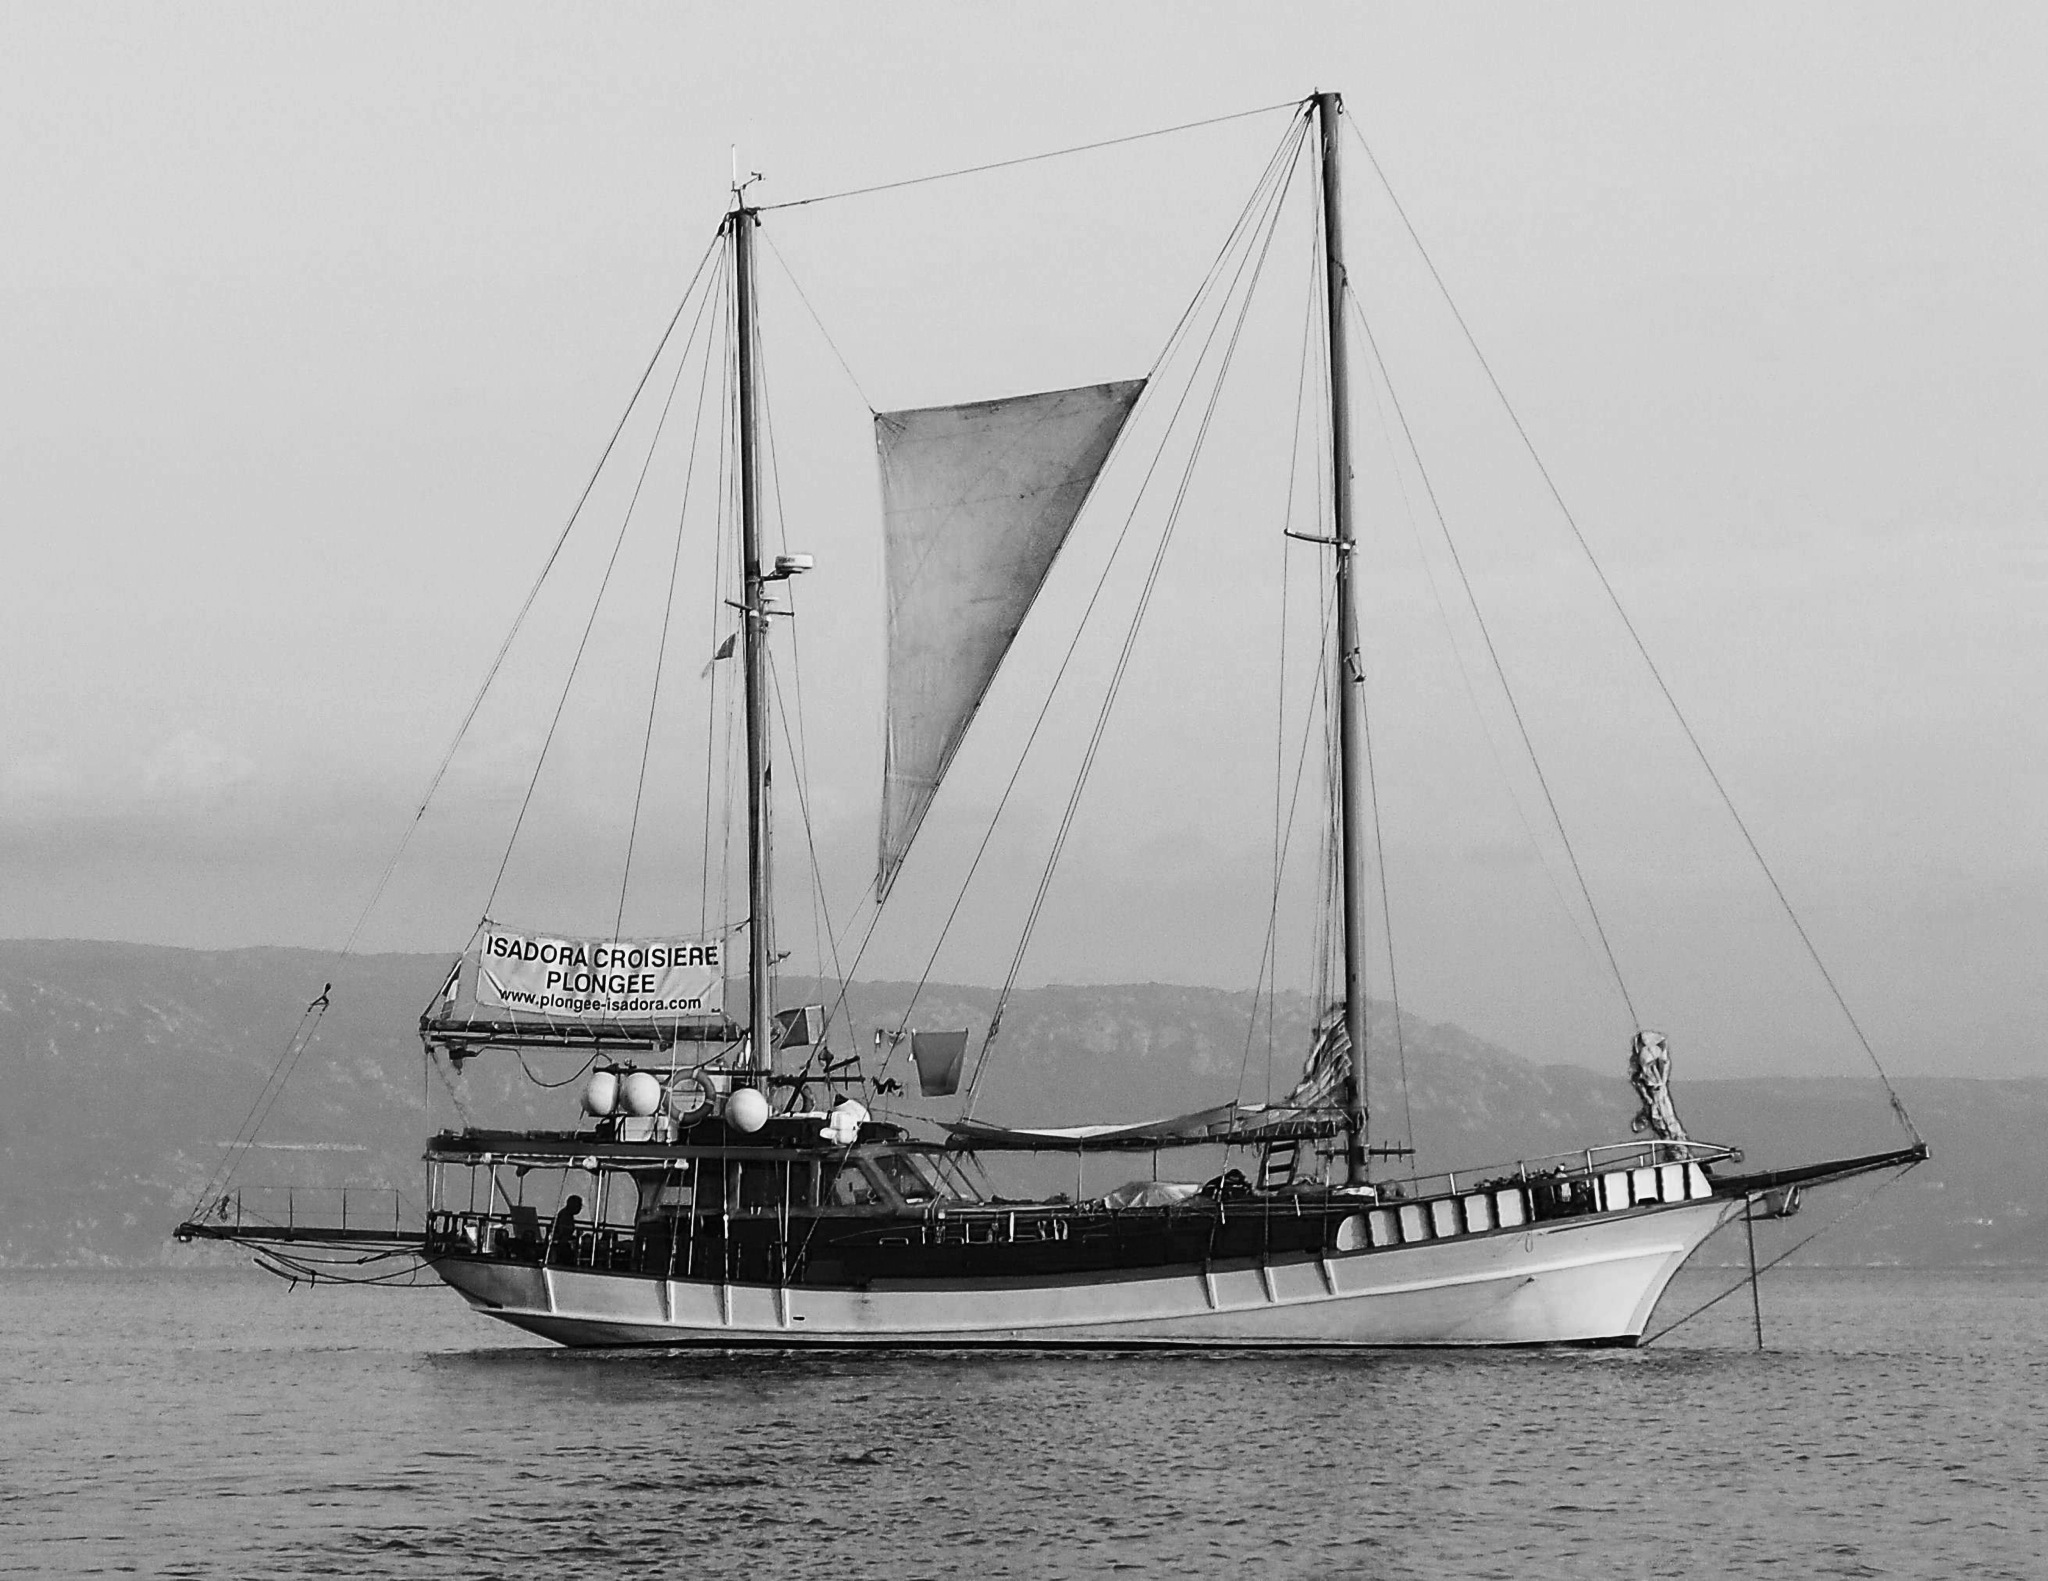 Isadora Croisière plongée